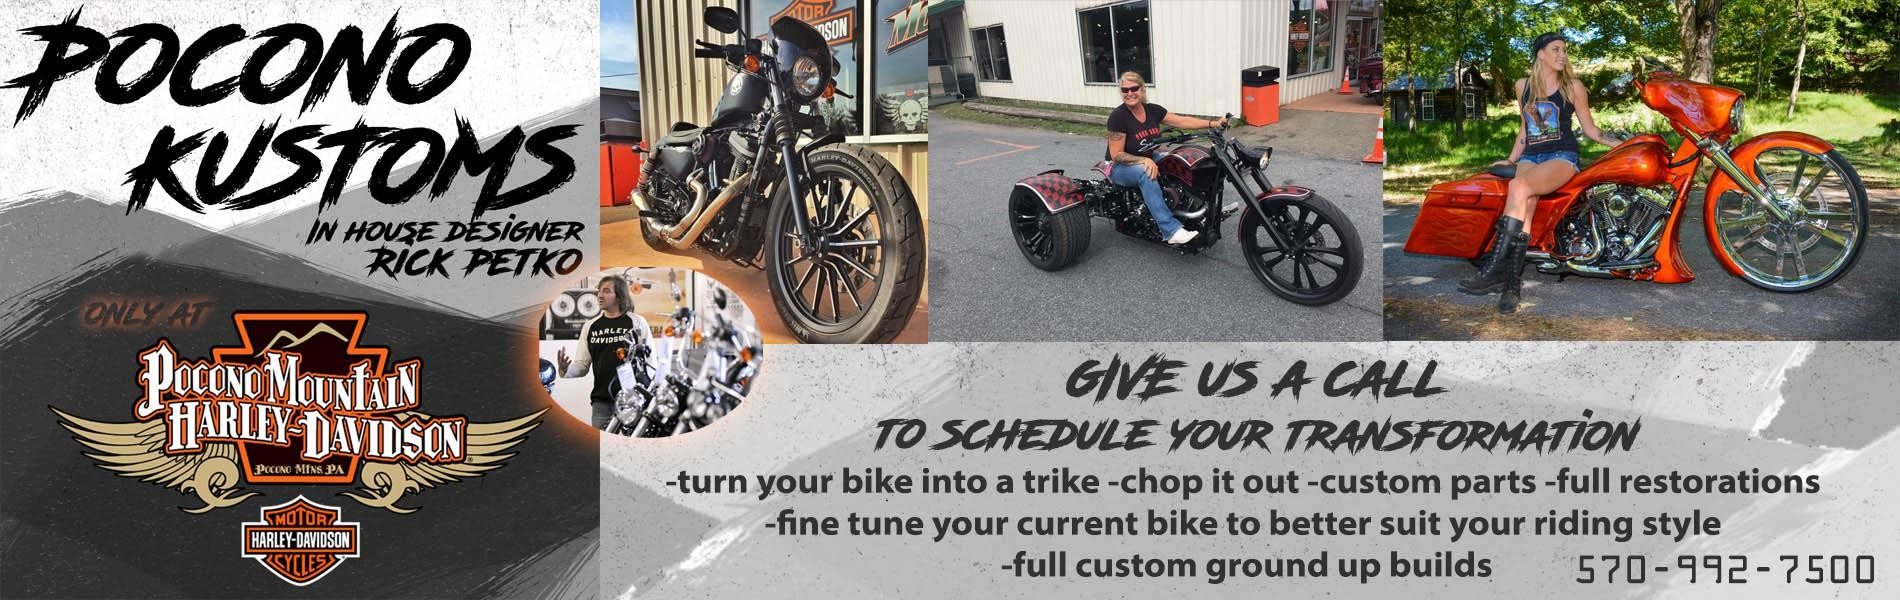 Pocono Harley Davidson >> Pocono Kustom S Past Fabrication And Customization Work Pocono